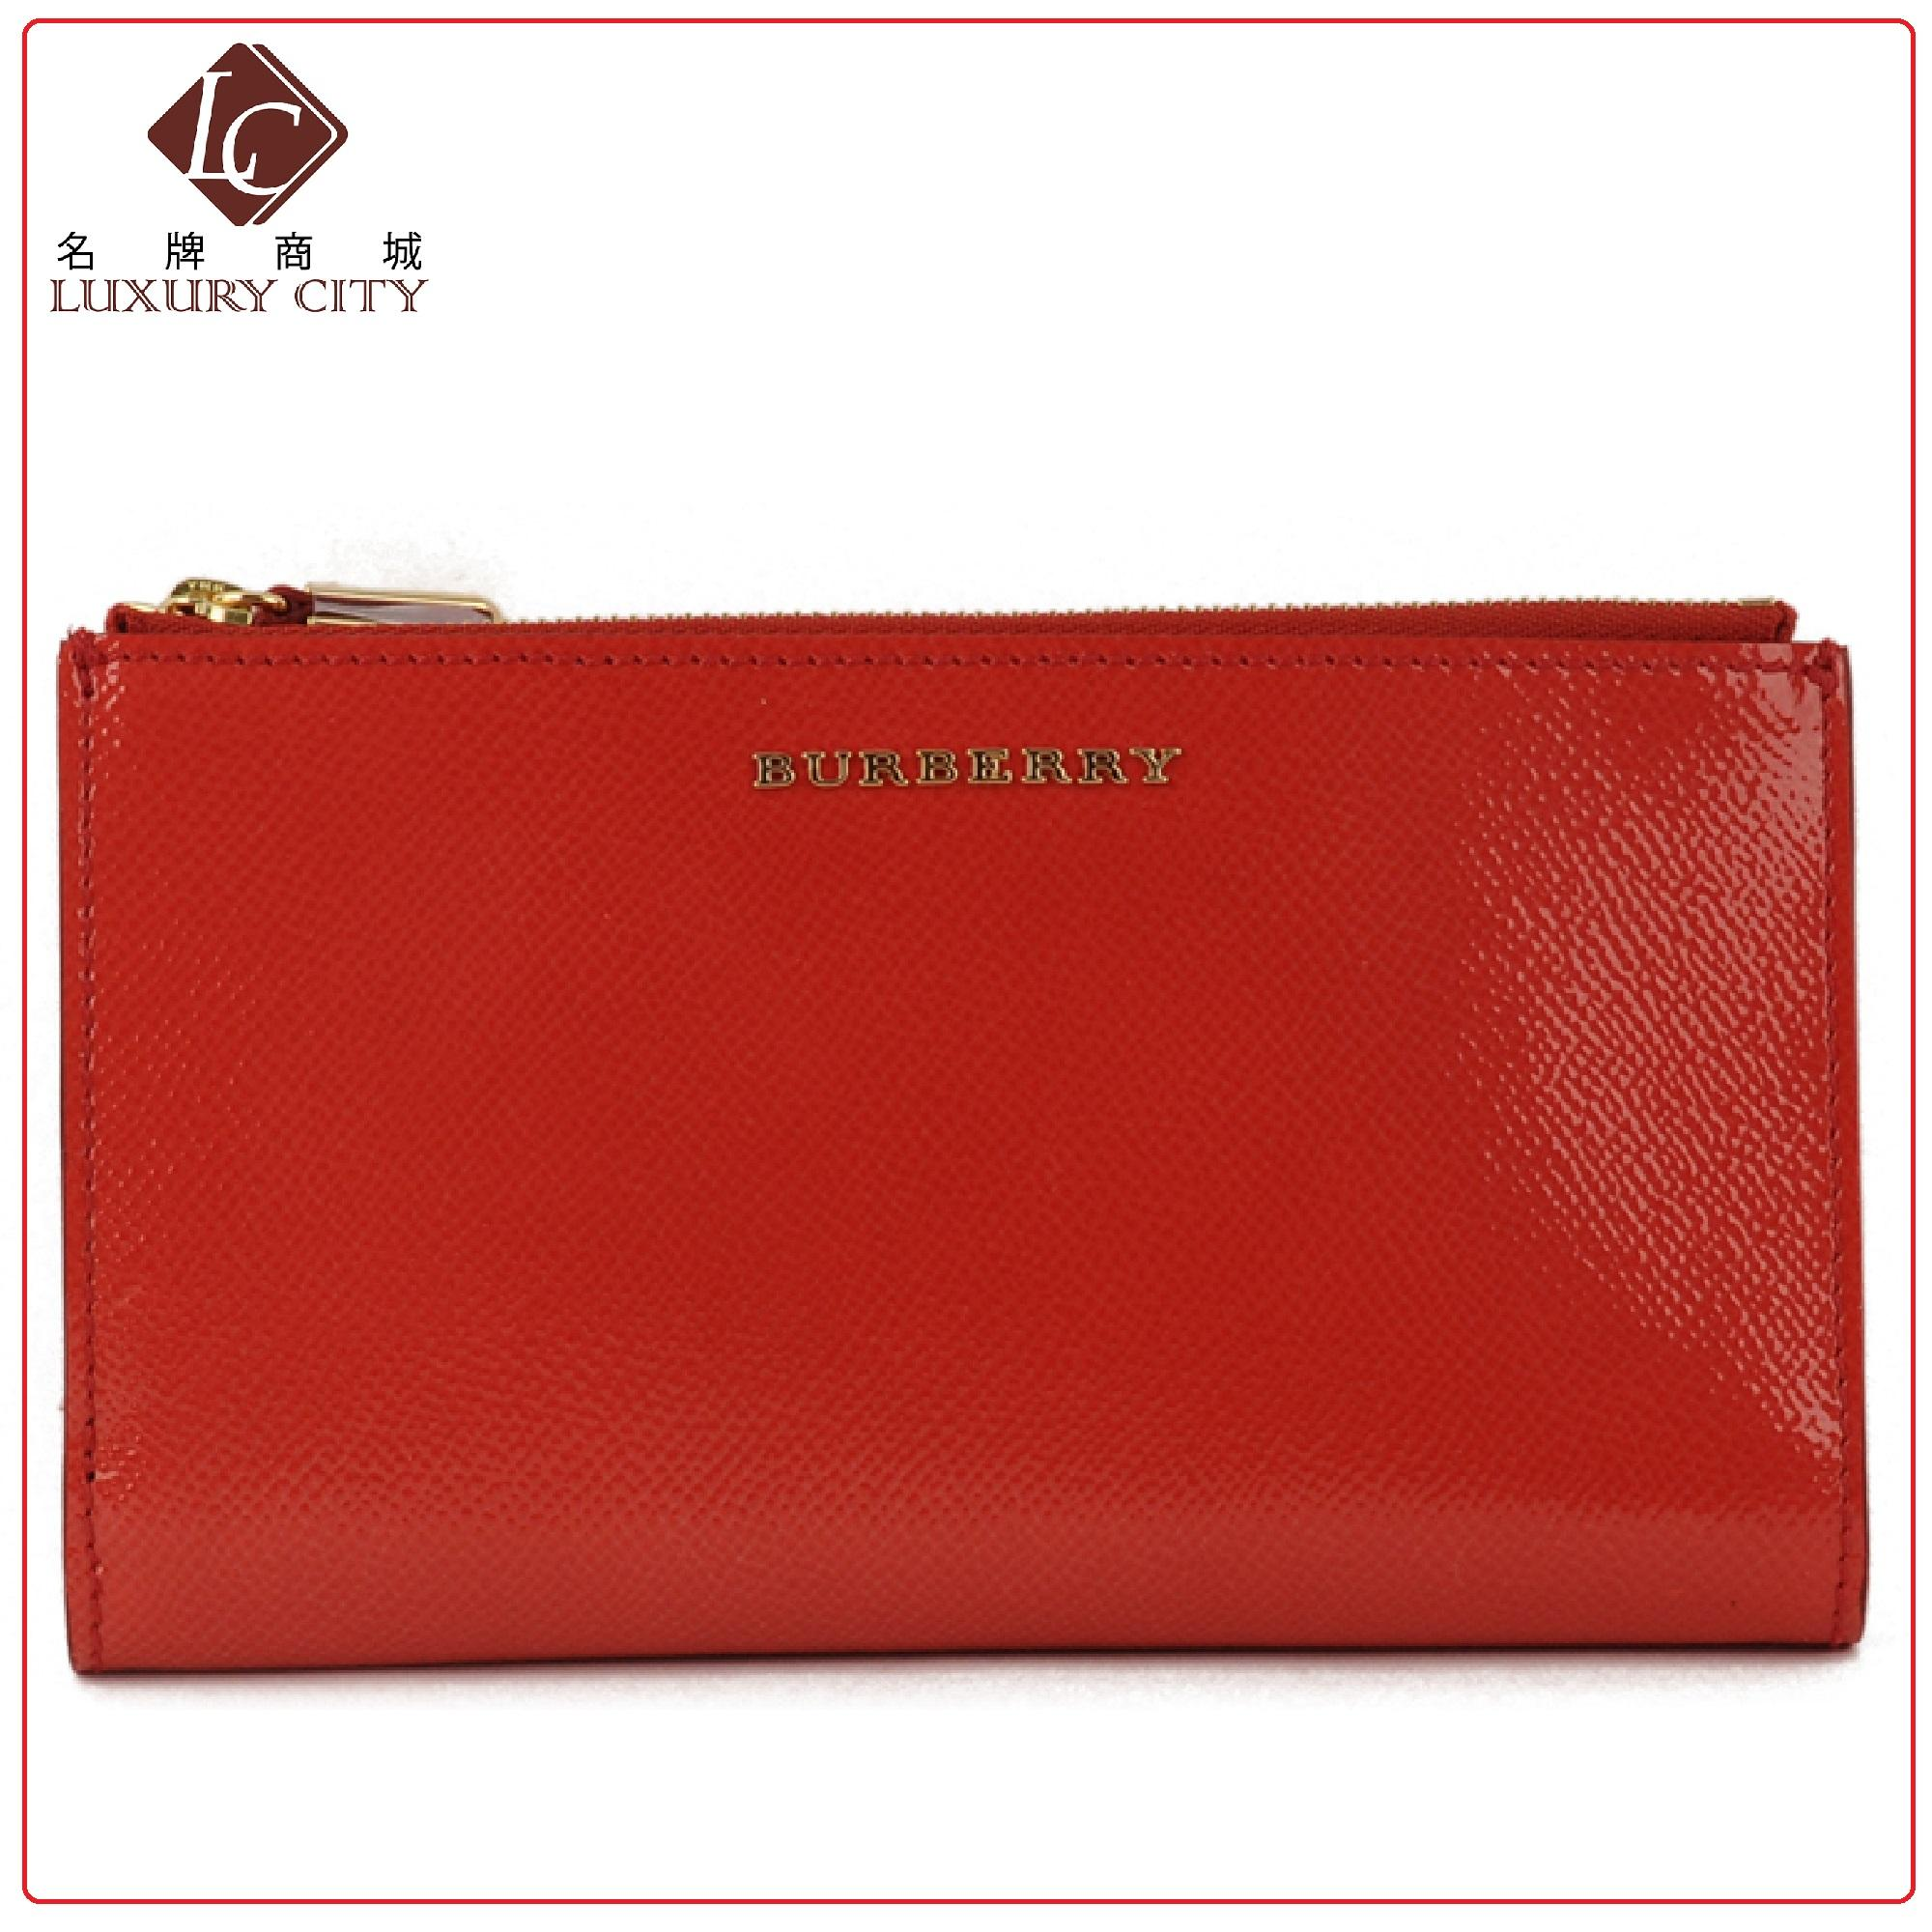 Buy Burberry Wallets   Accessories Online   Lazada f2fc5c42c8